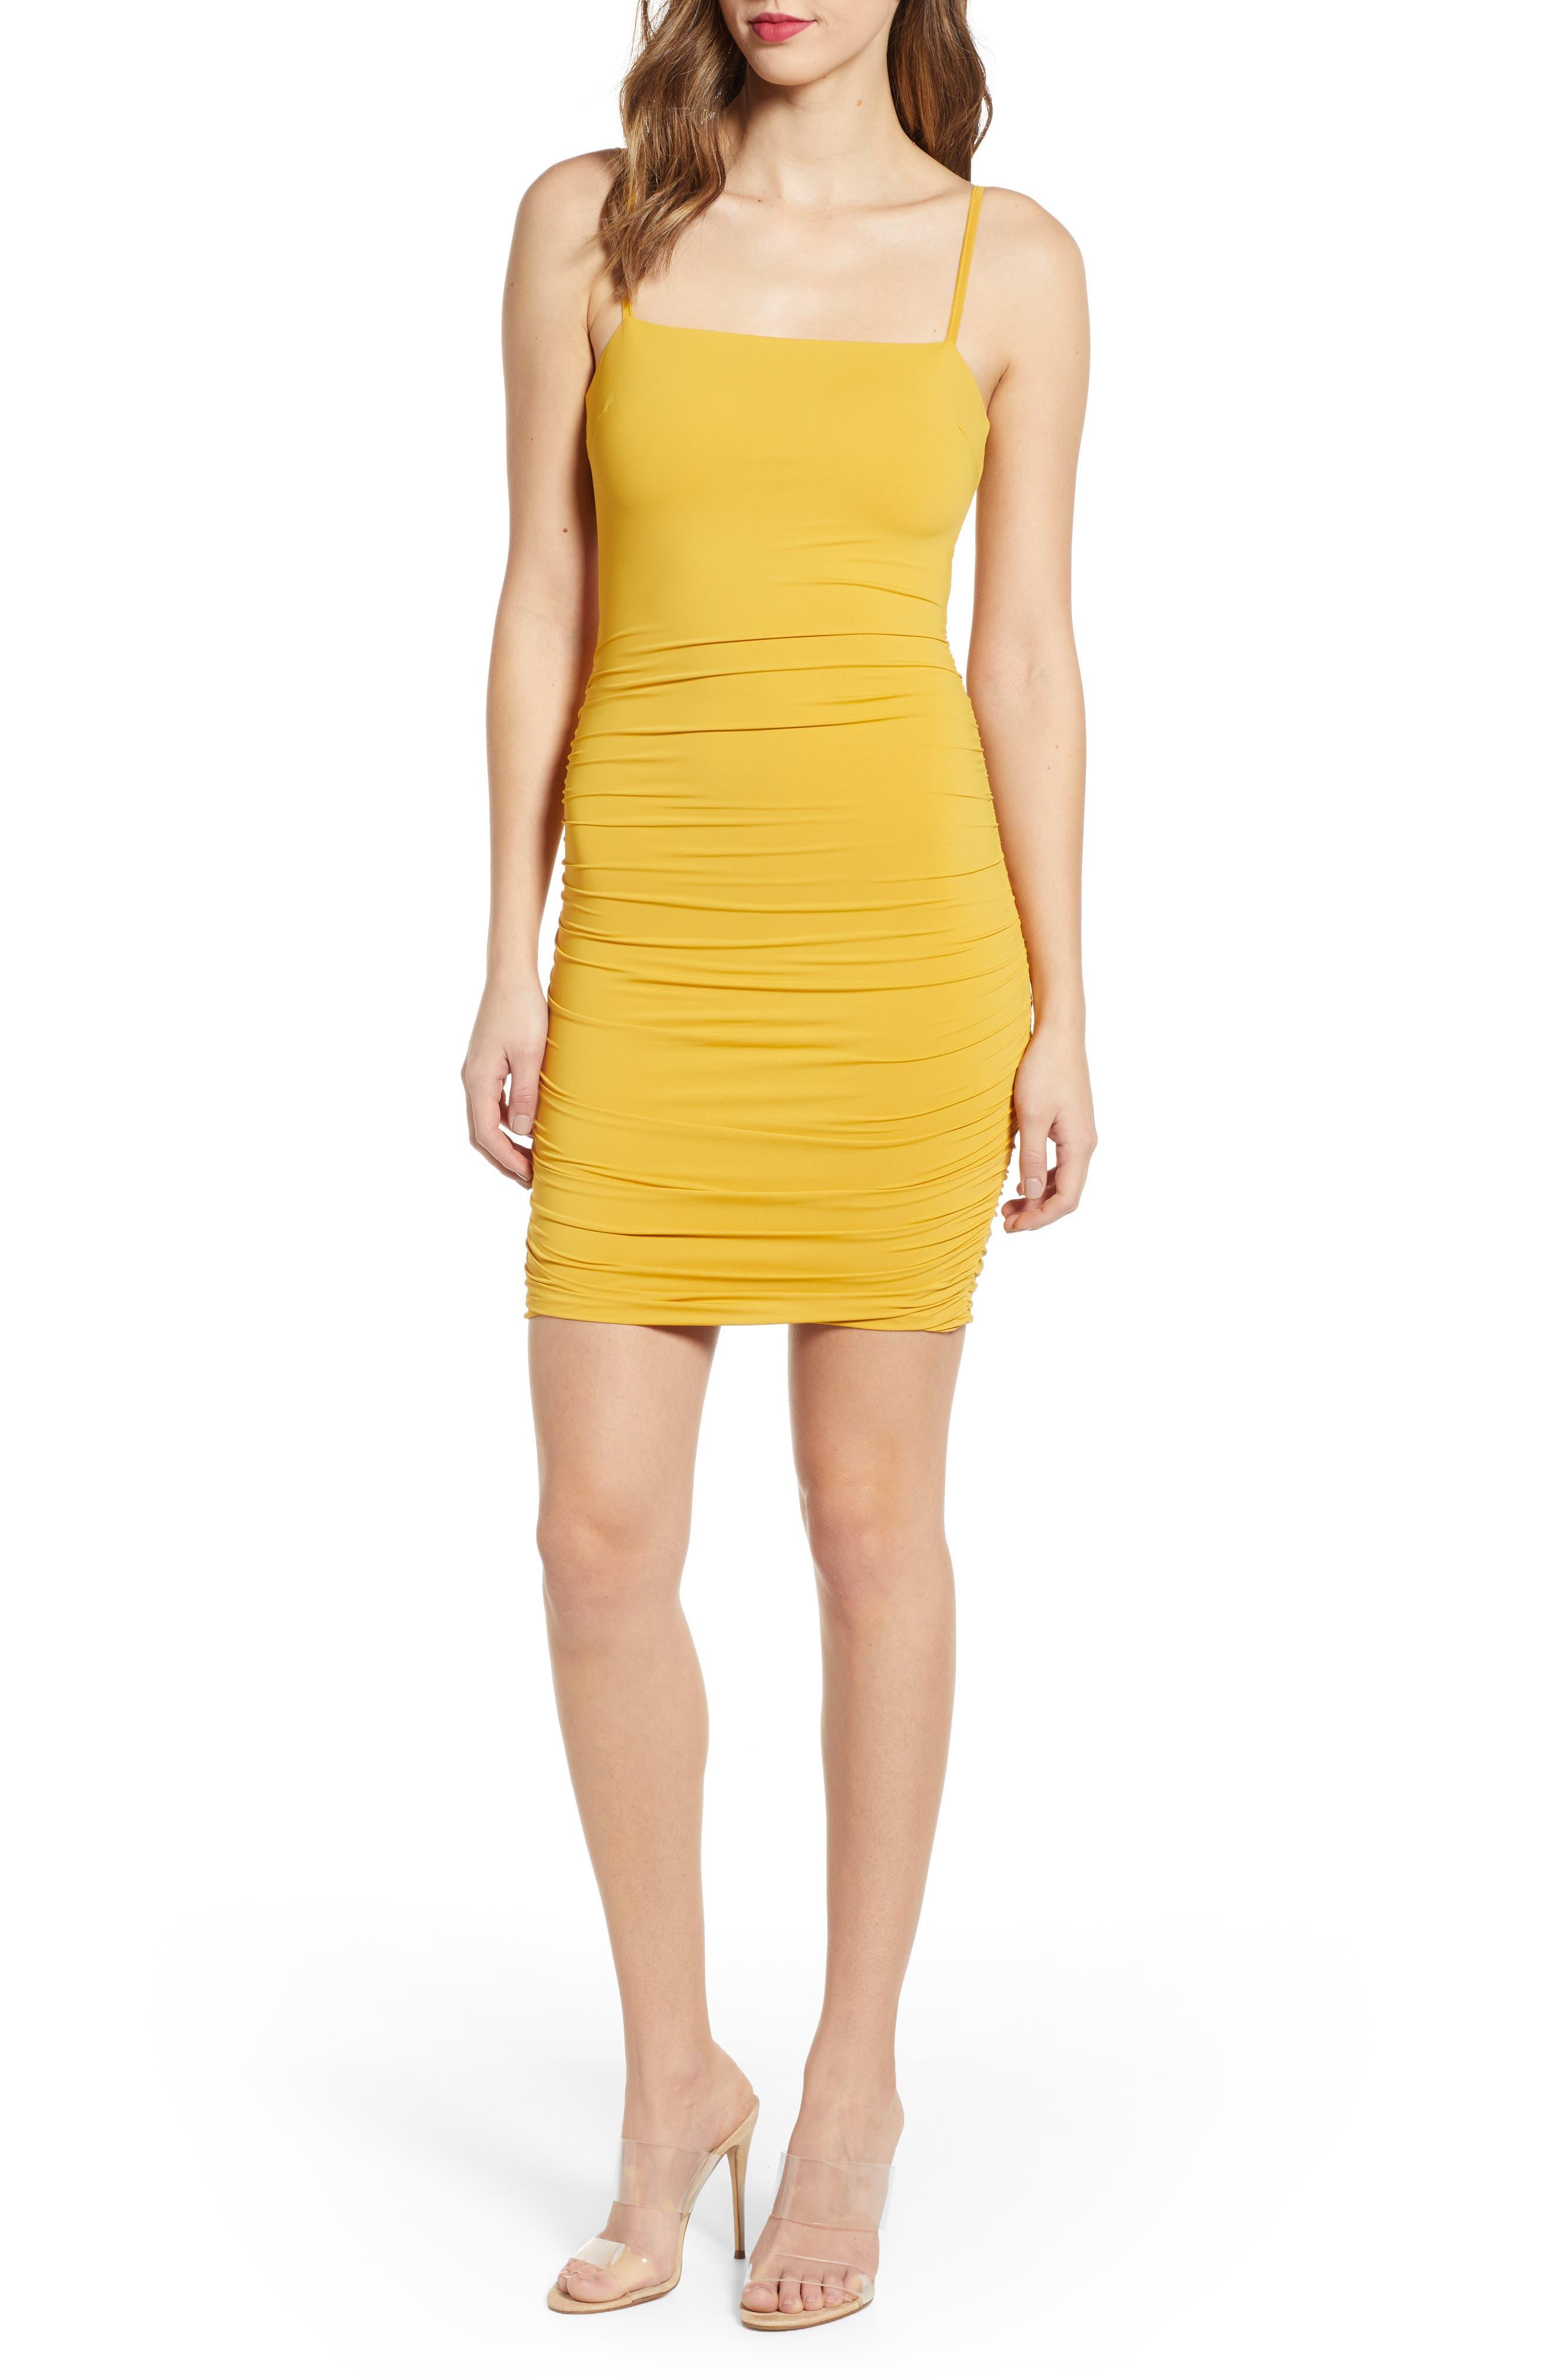 Tiger Mist Sunrise Dress, Yellow